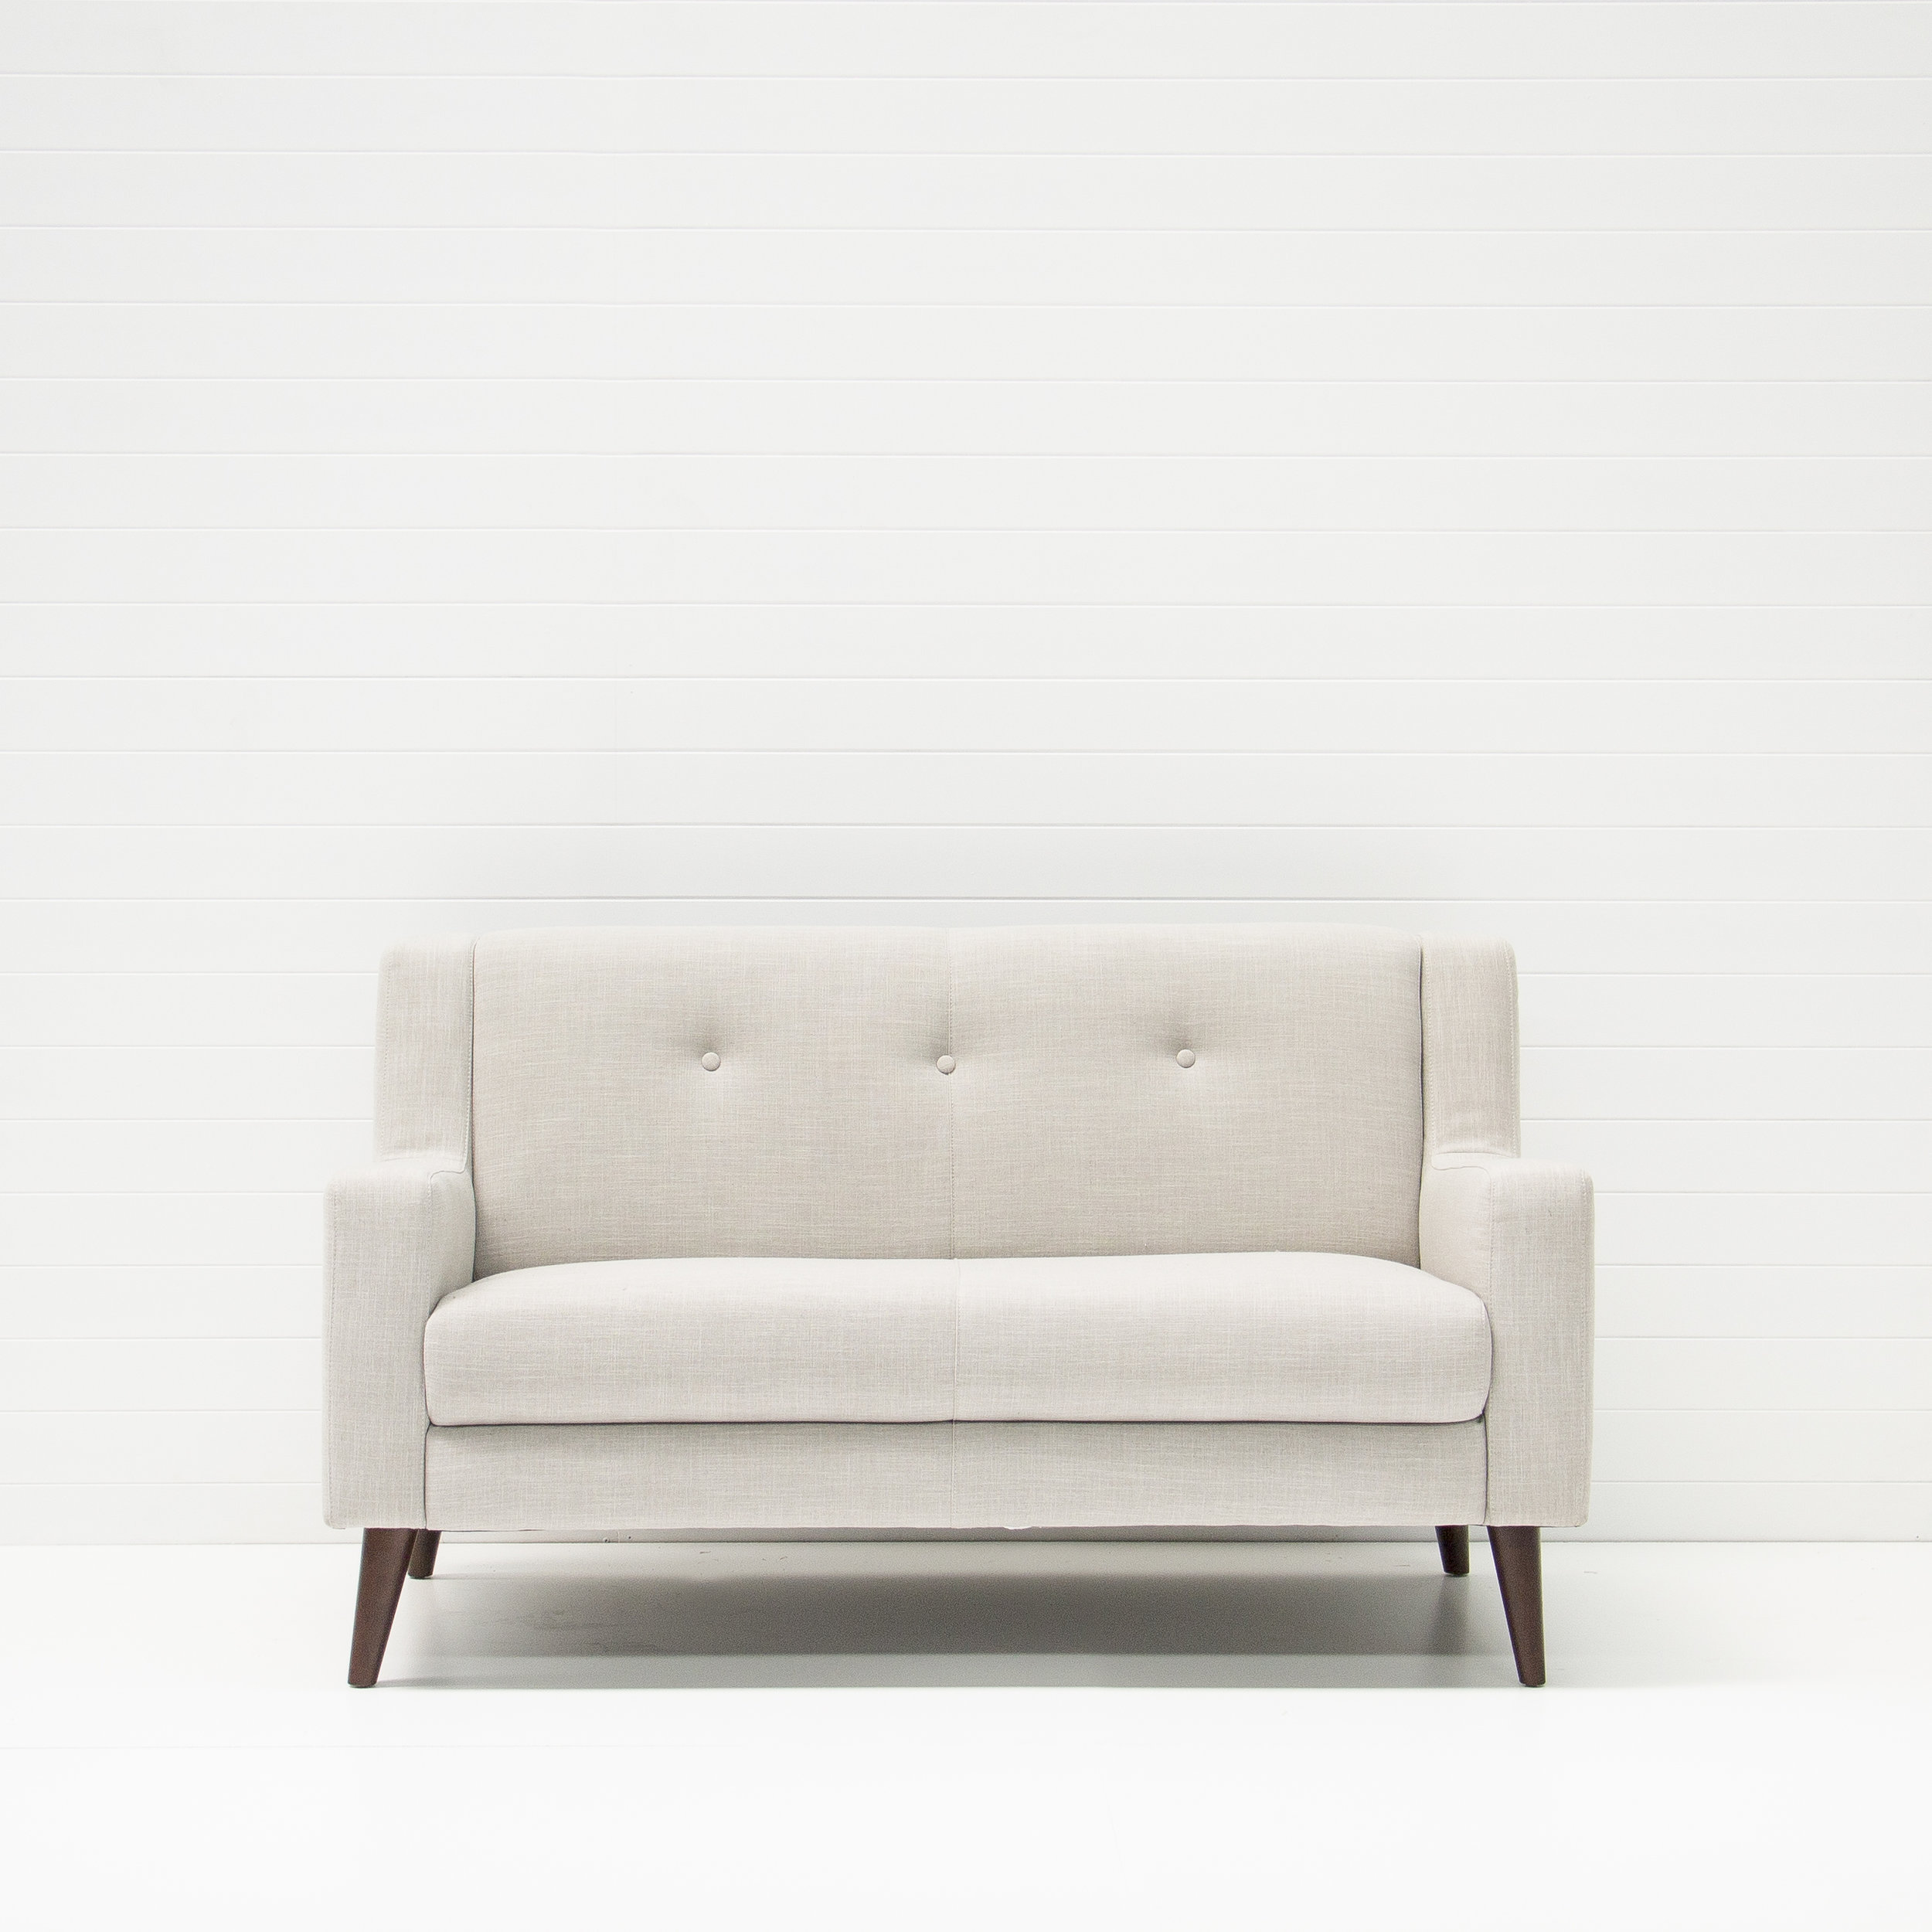 2 seater Parisian sofa